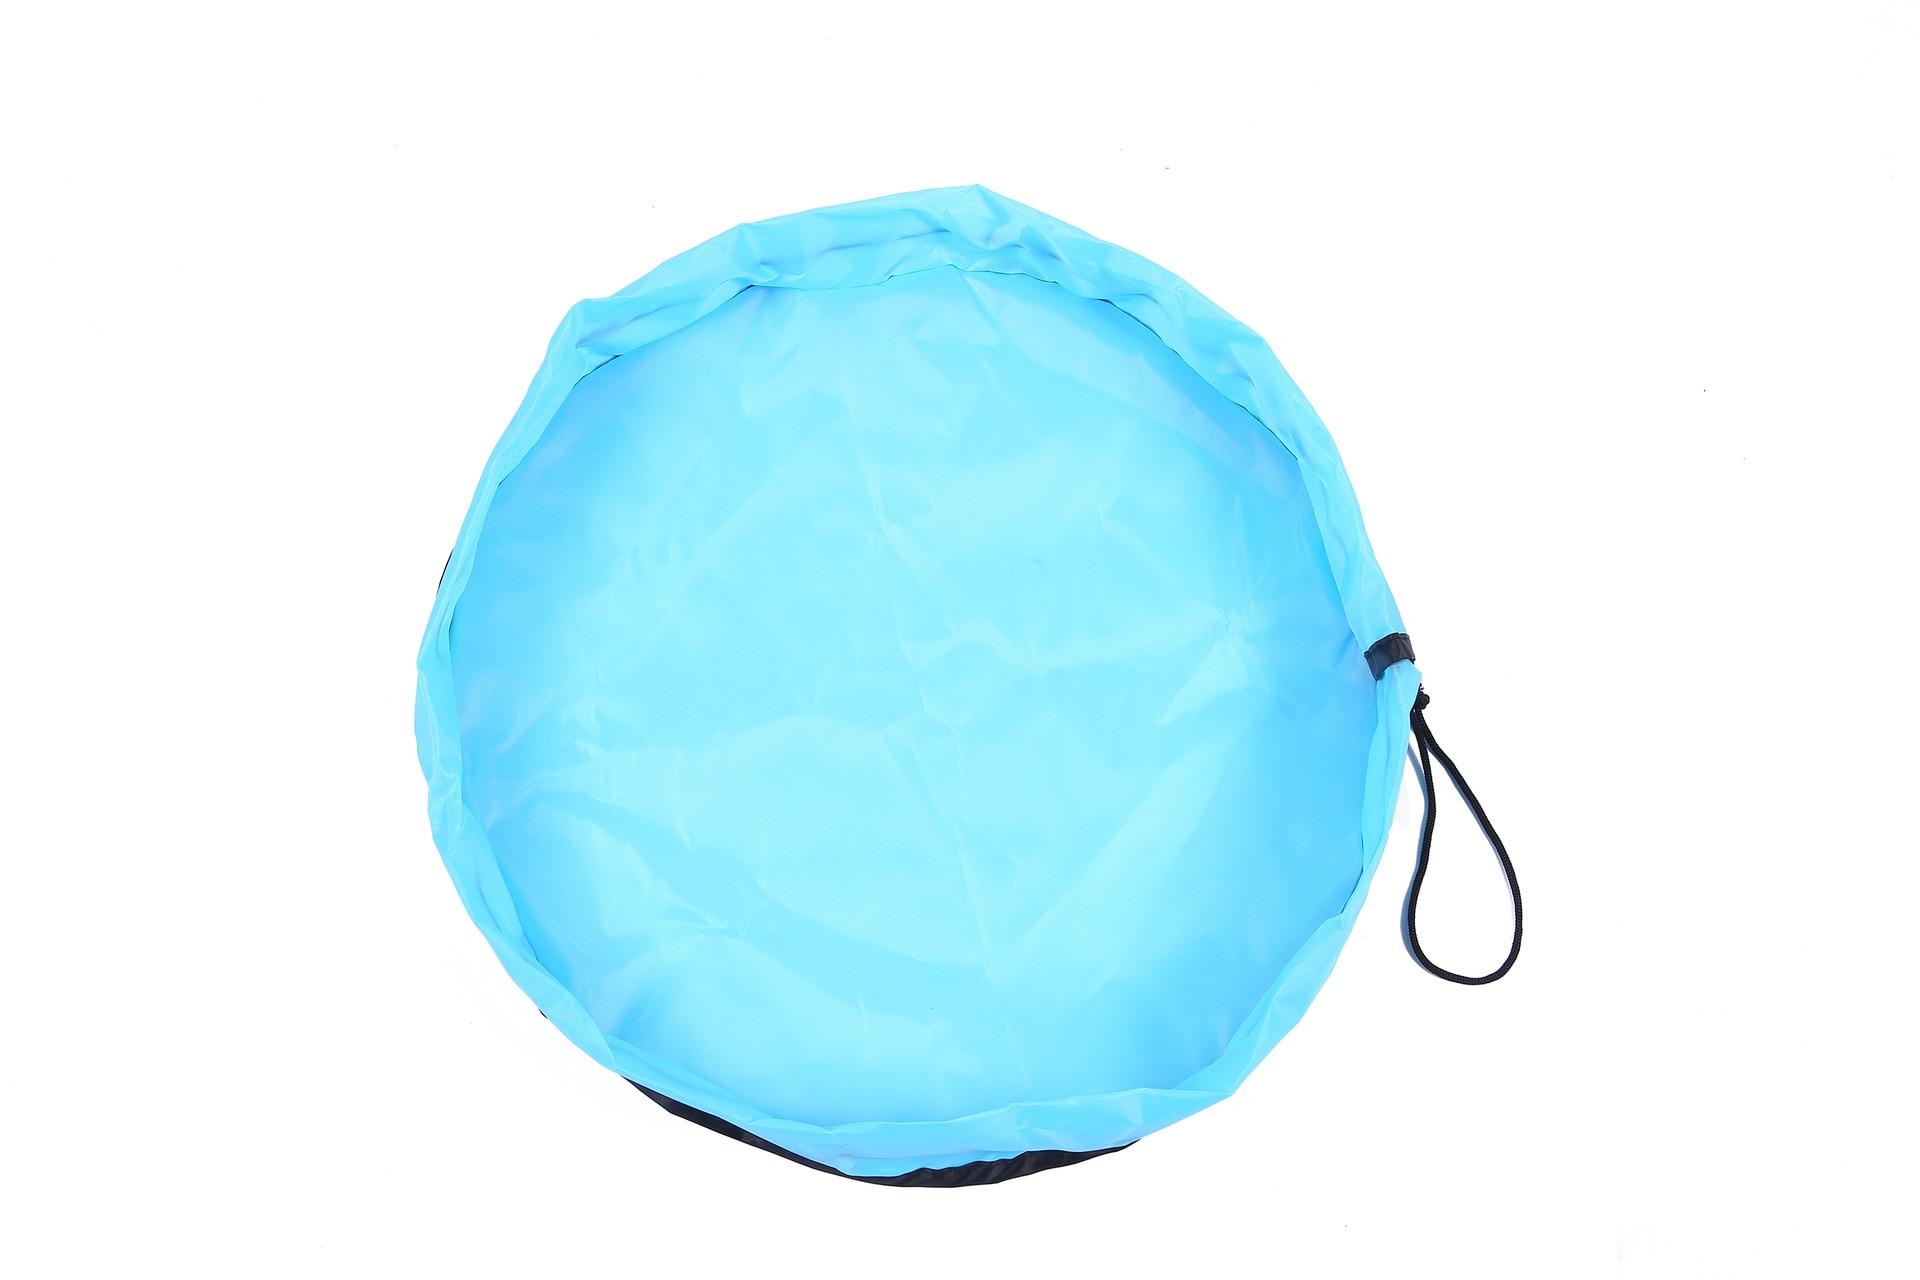 H0d8b46ed8fb84f8a80110924e51bbaf6Q 2020 Multifunctional baby toy fast storage bag play mat outdoor children's waterproof toy mat beam storage bag beach mat